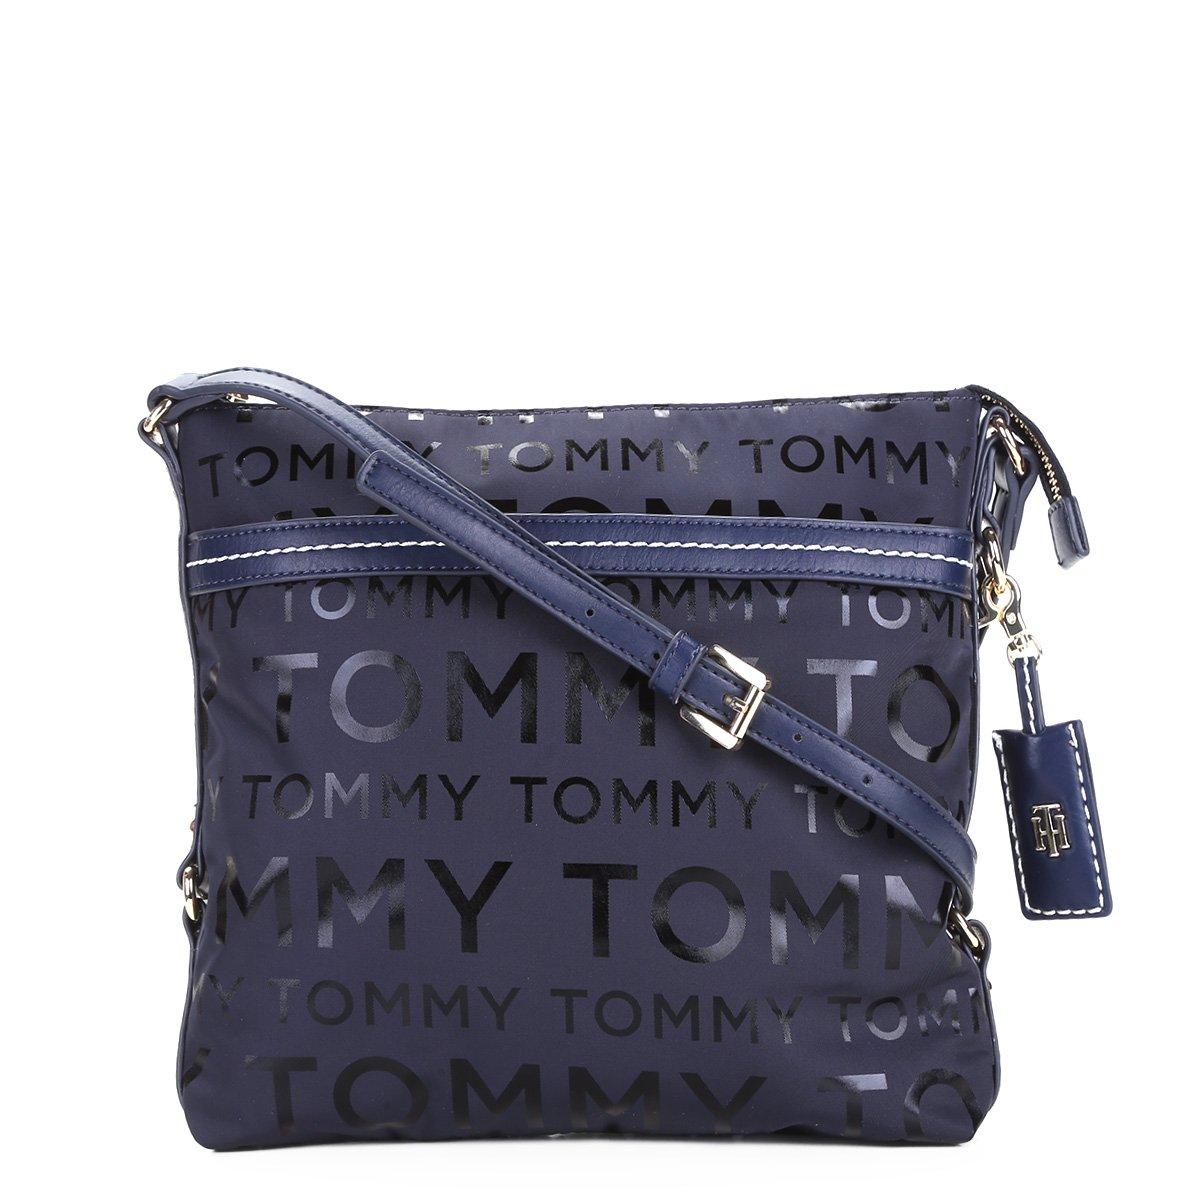 15b0e35d78 Bolsa Transversal Tommy Hilfiger Feminina - Compre Agora